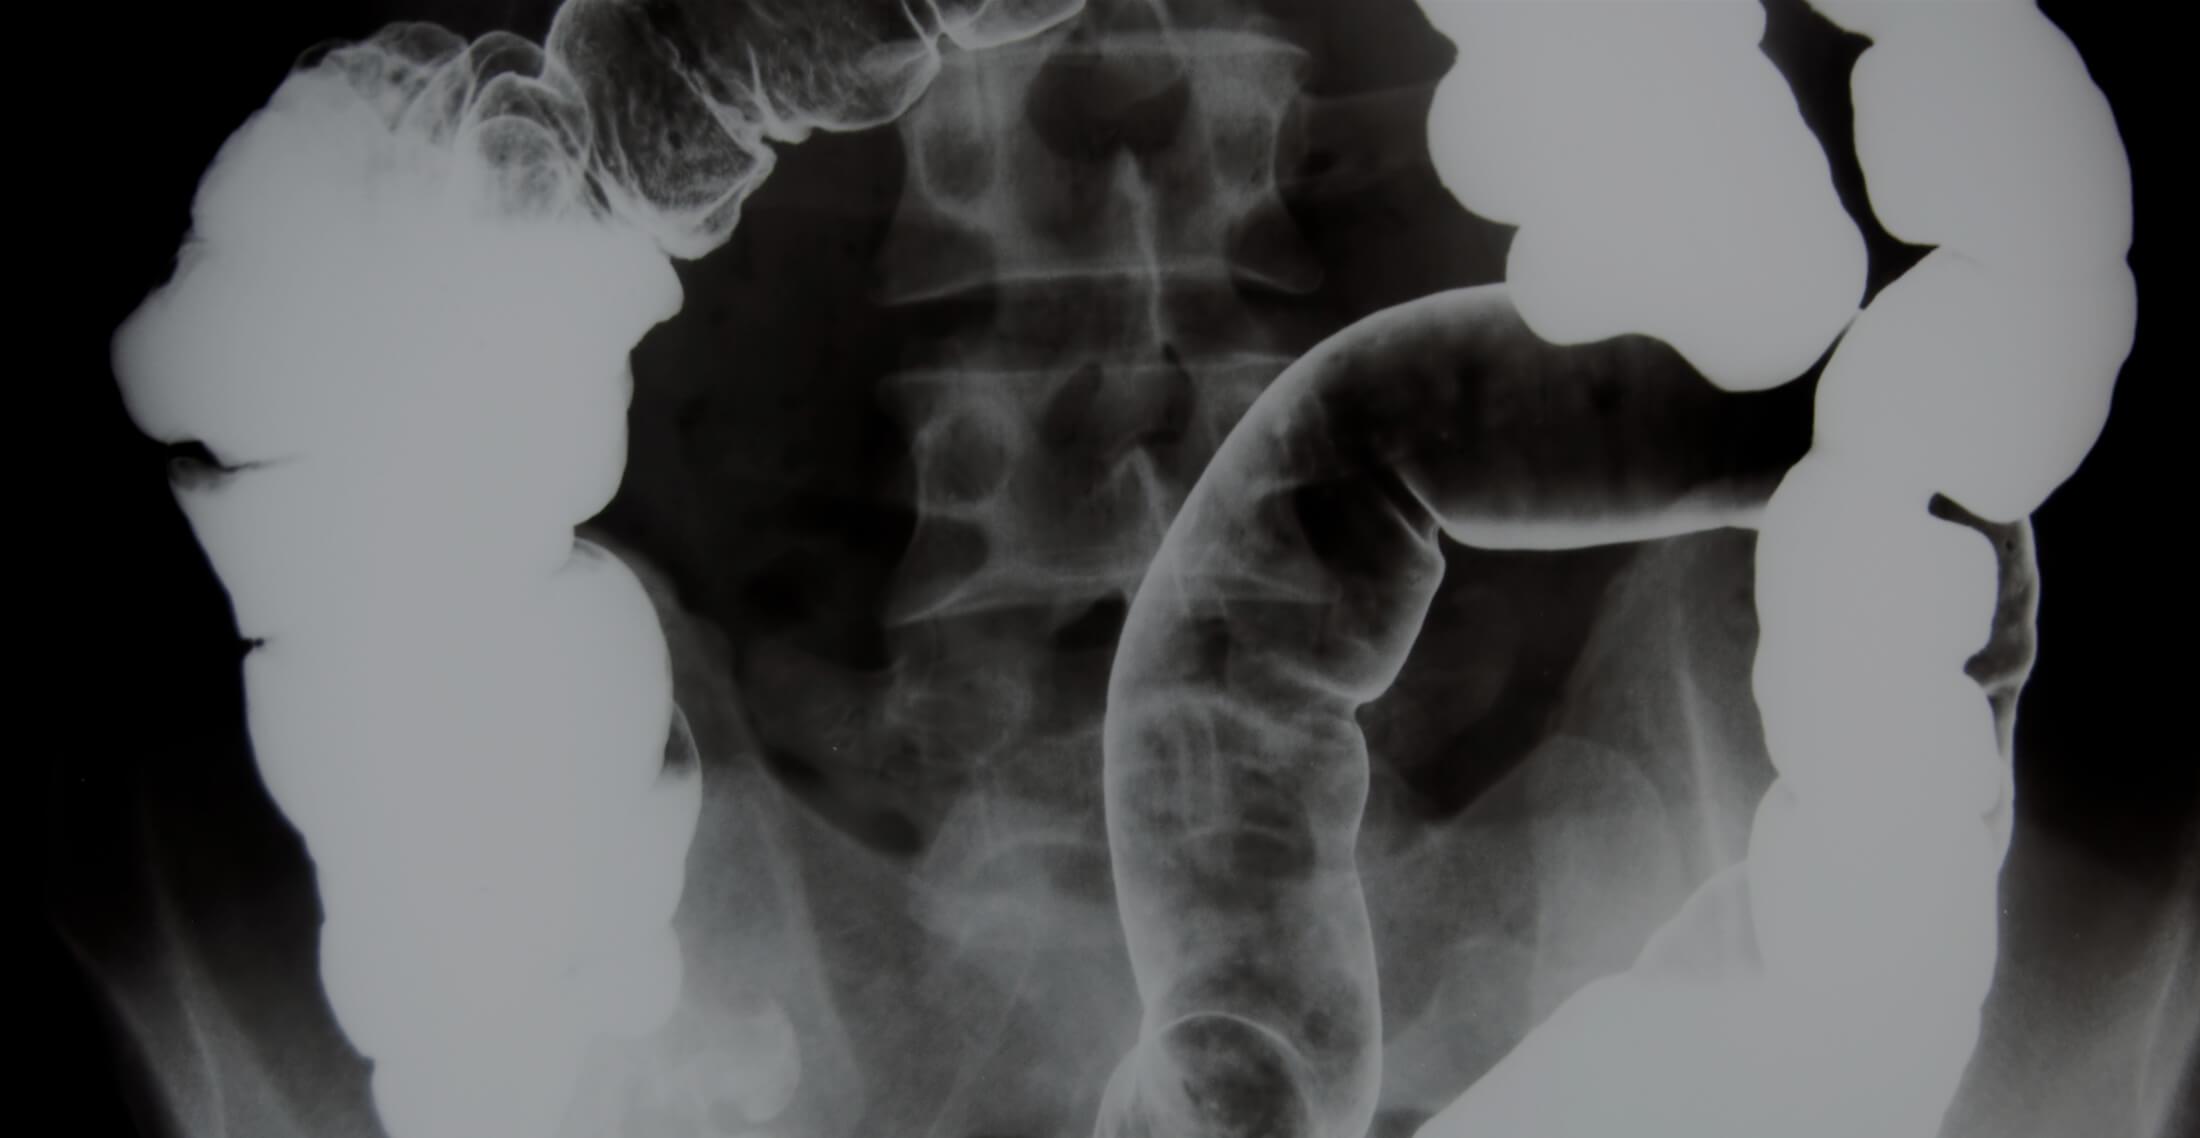 Mikrobiom-Reizdarm-Studie 2019